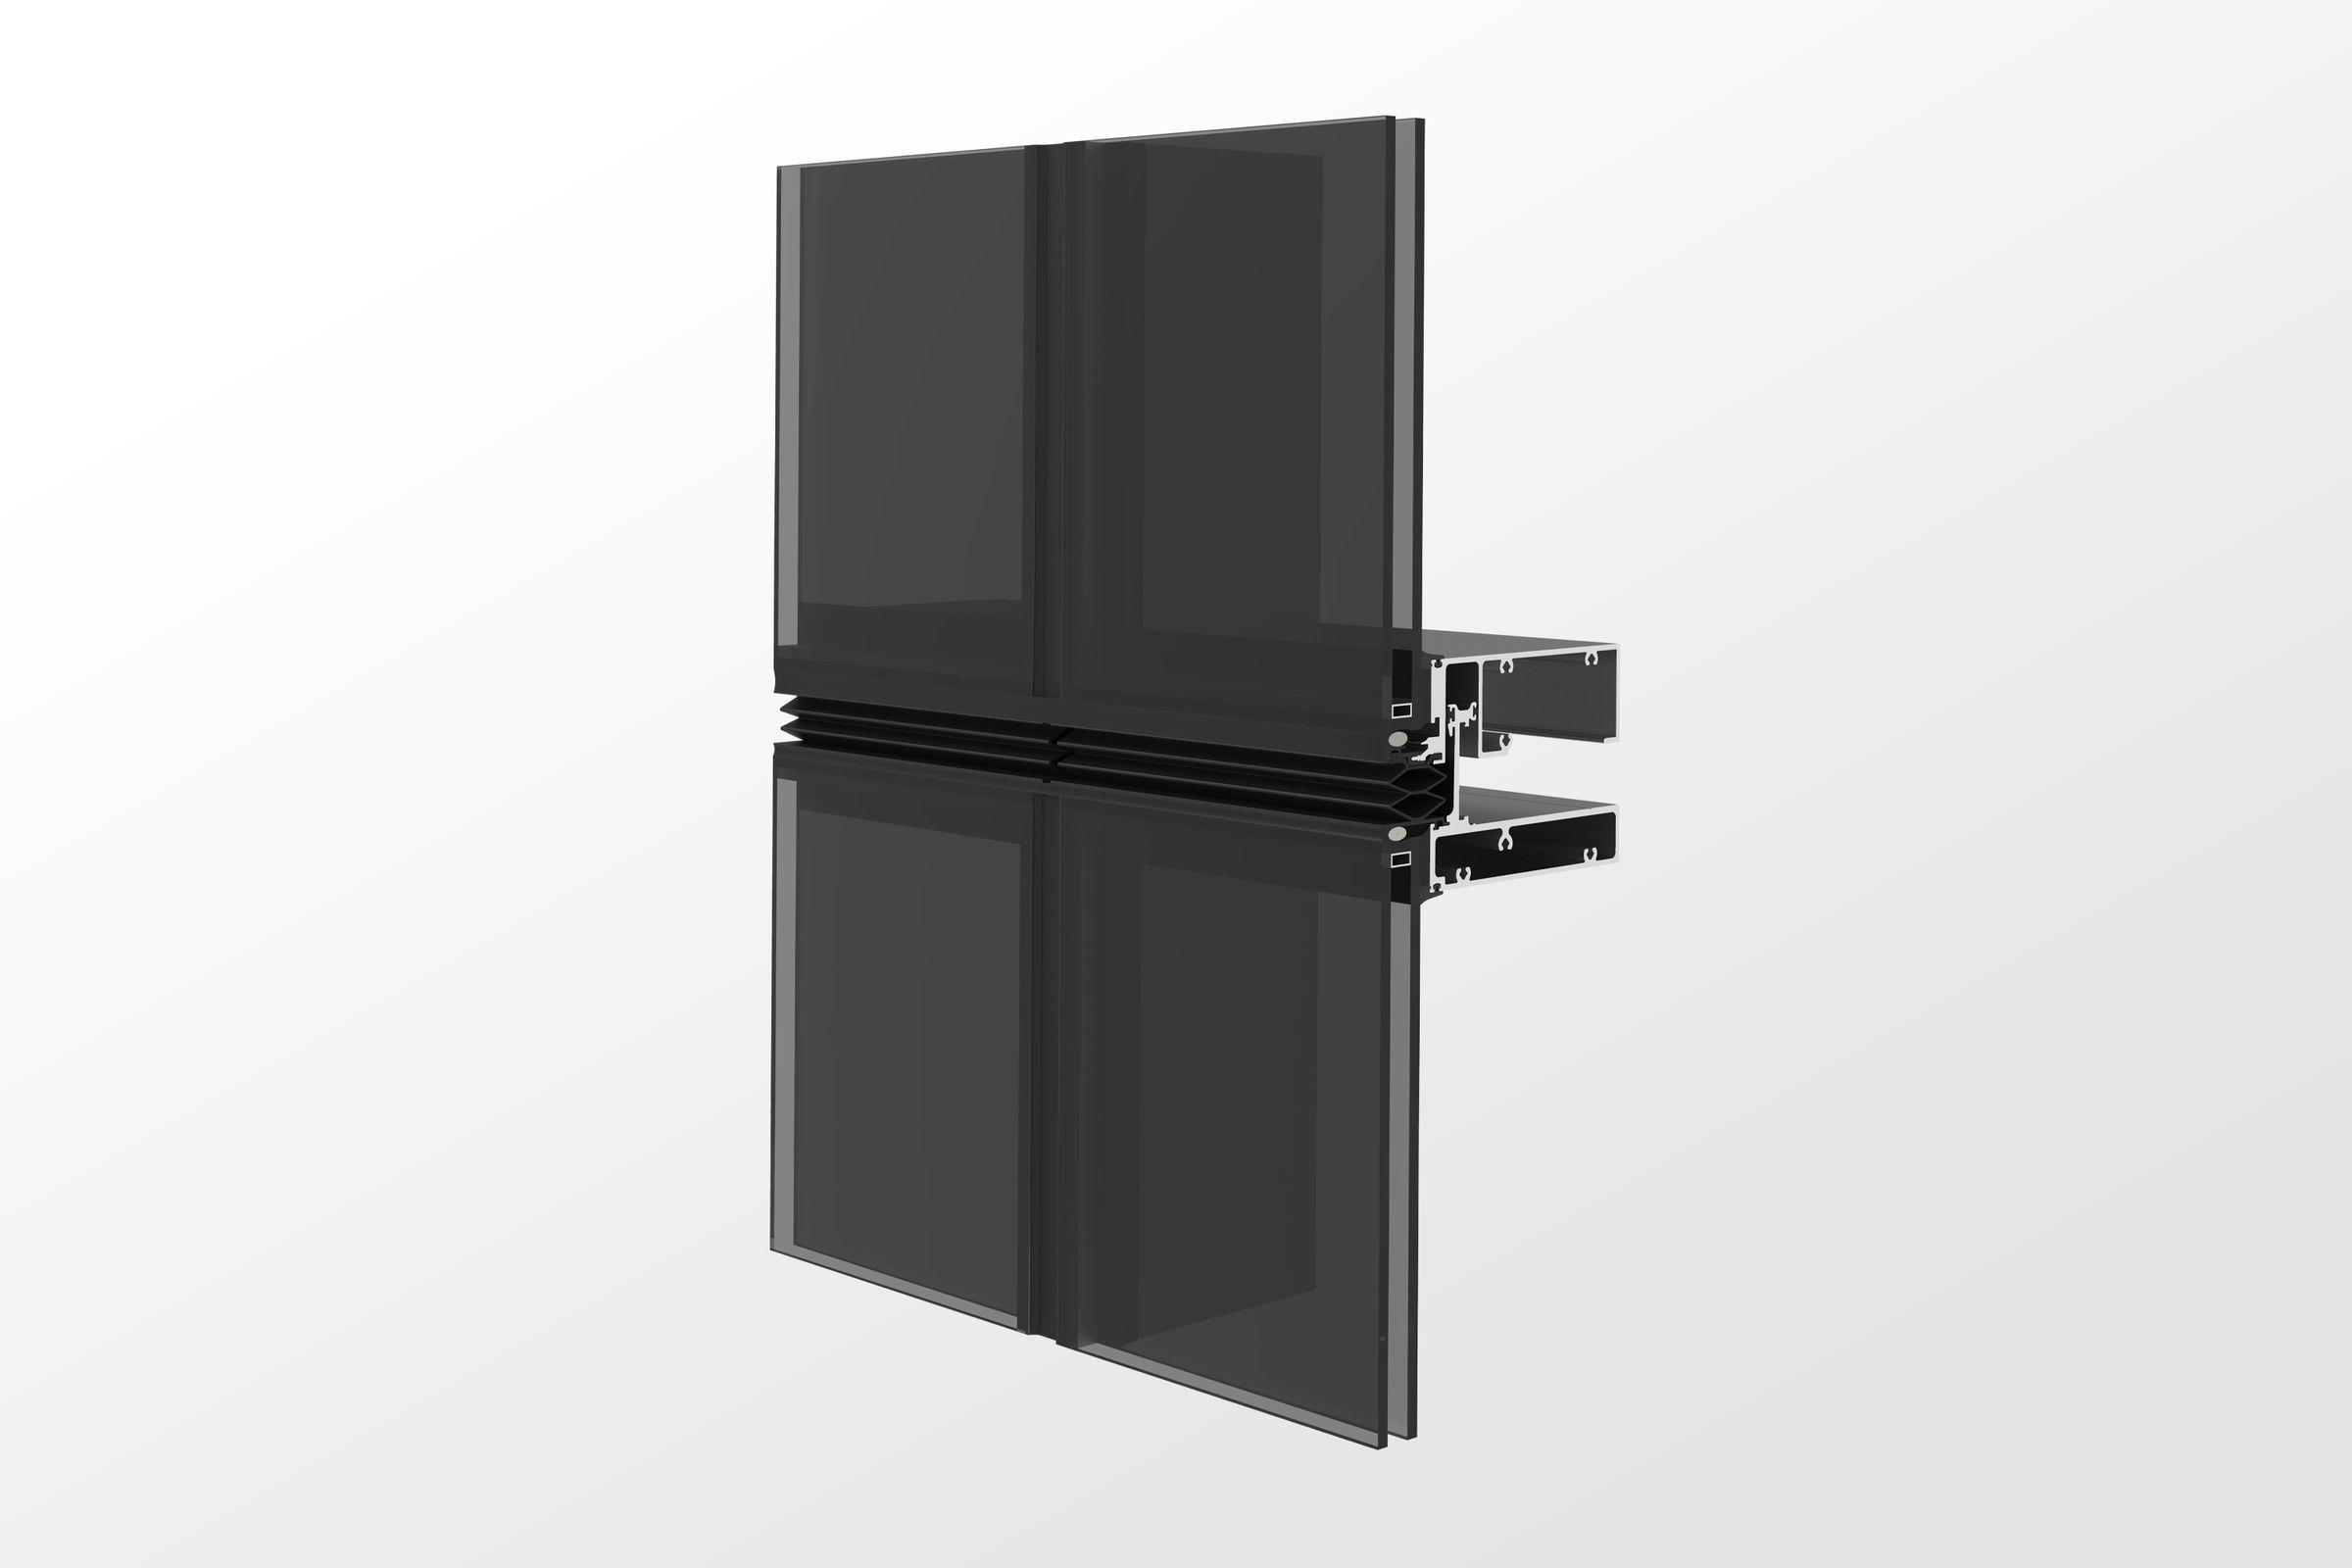 YUW 750 XT Unitized Wall System